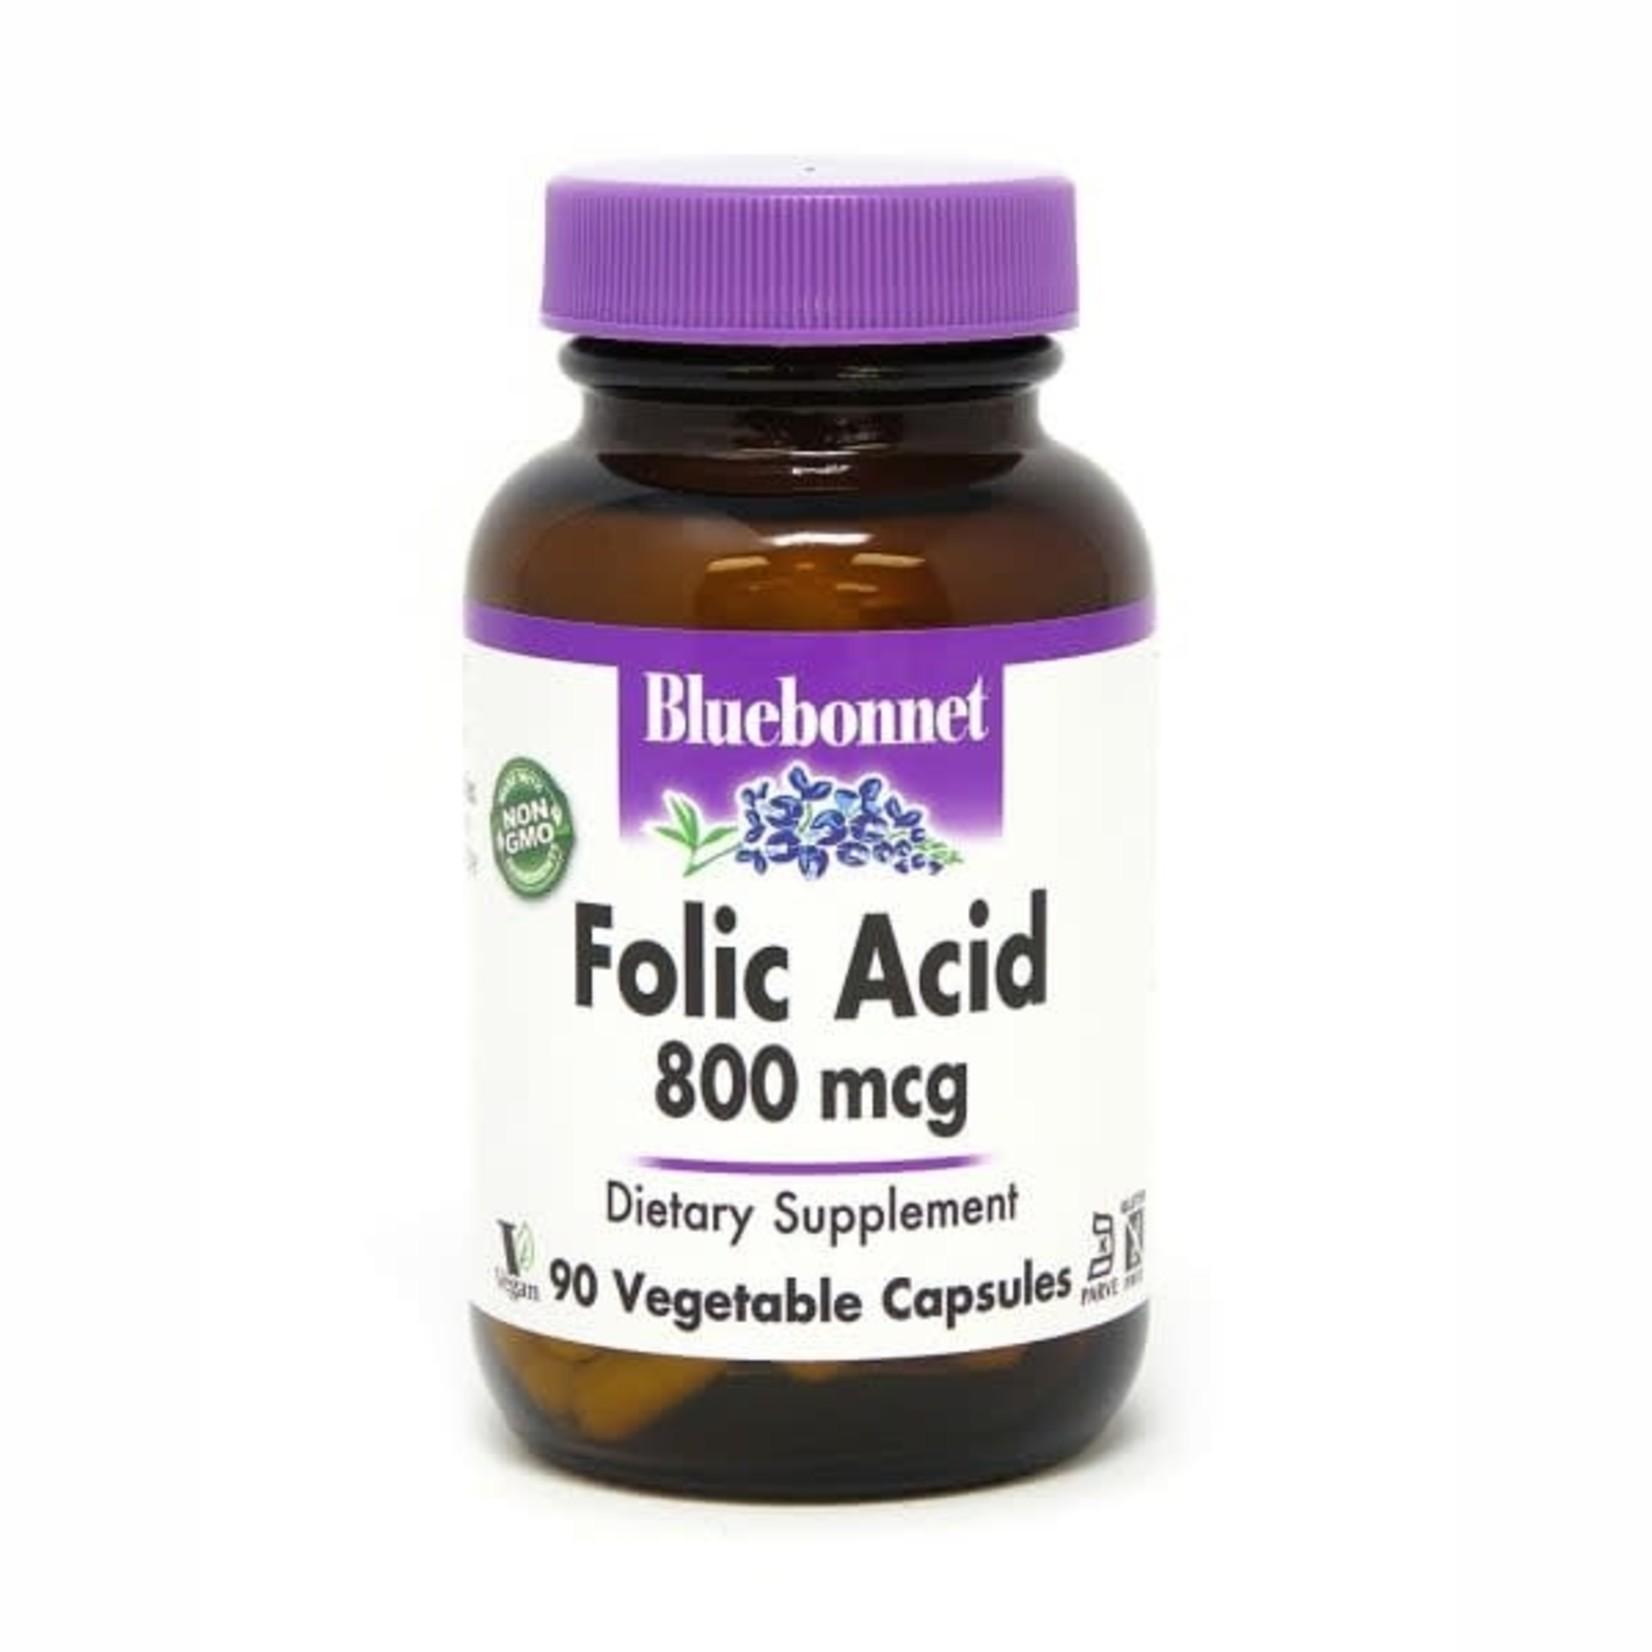 BlueBonnet Bluebonnet Folic Acid800mg 90ct